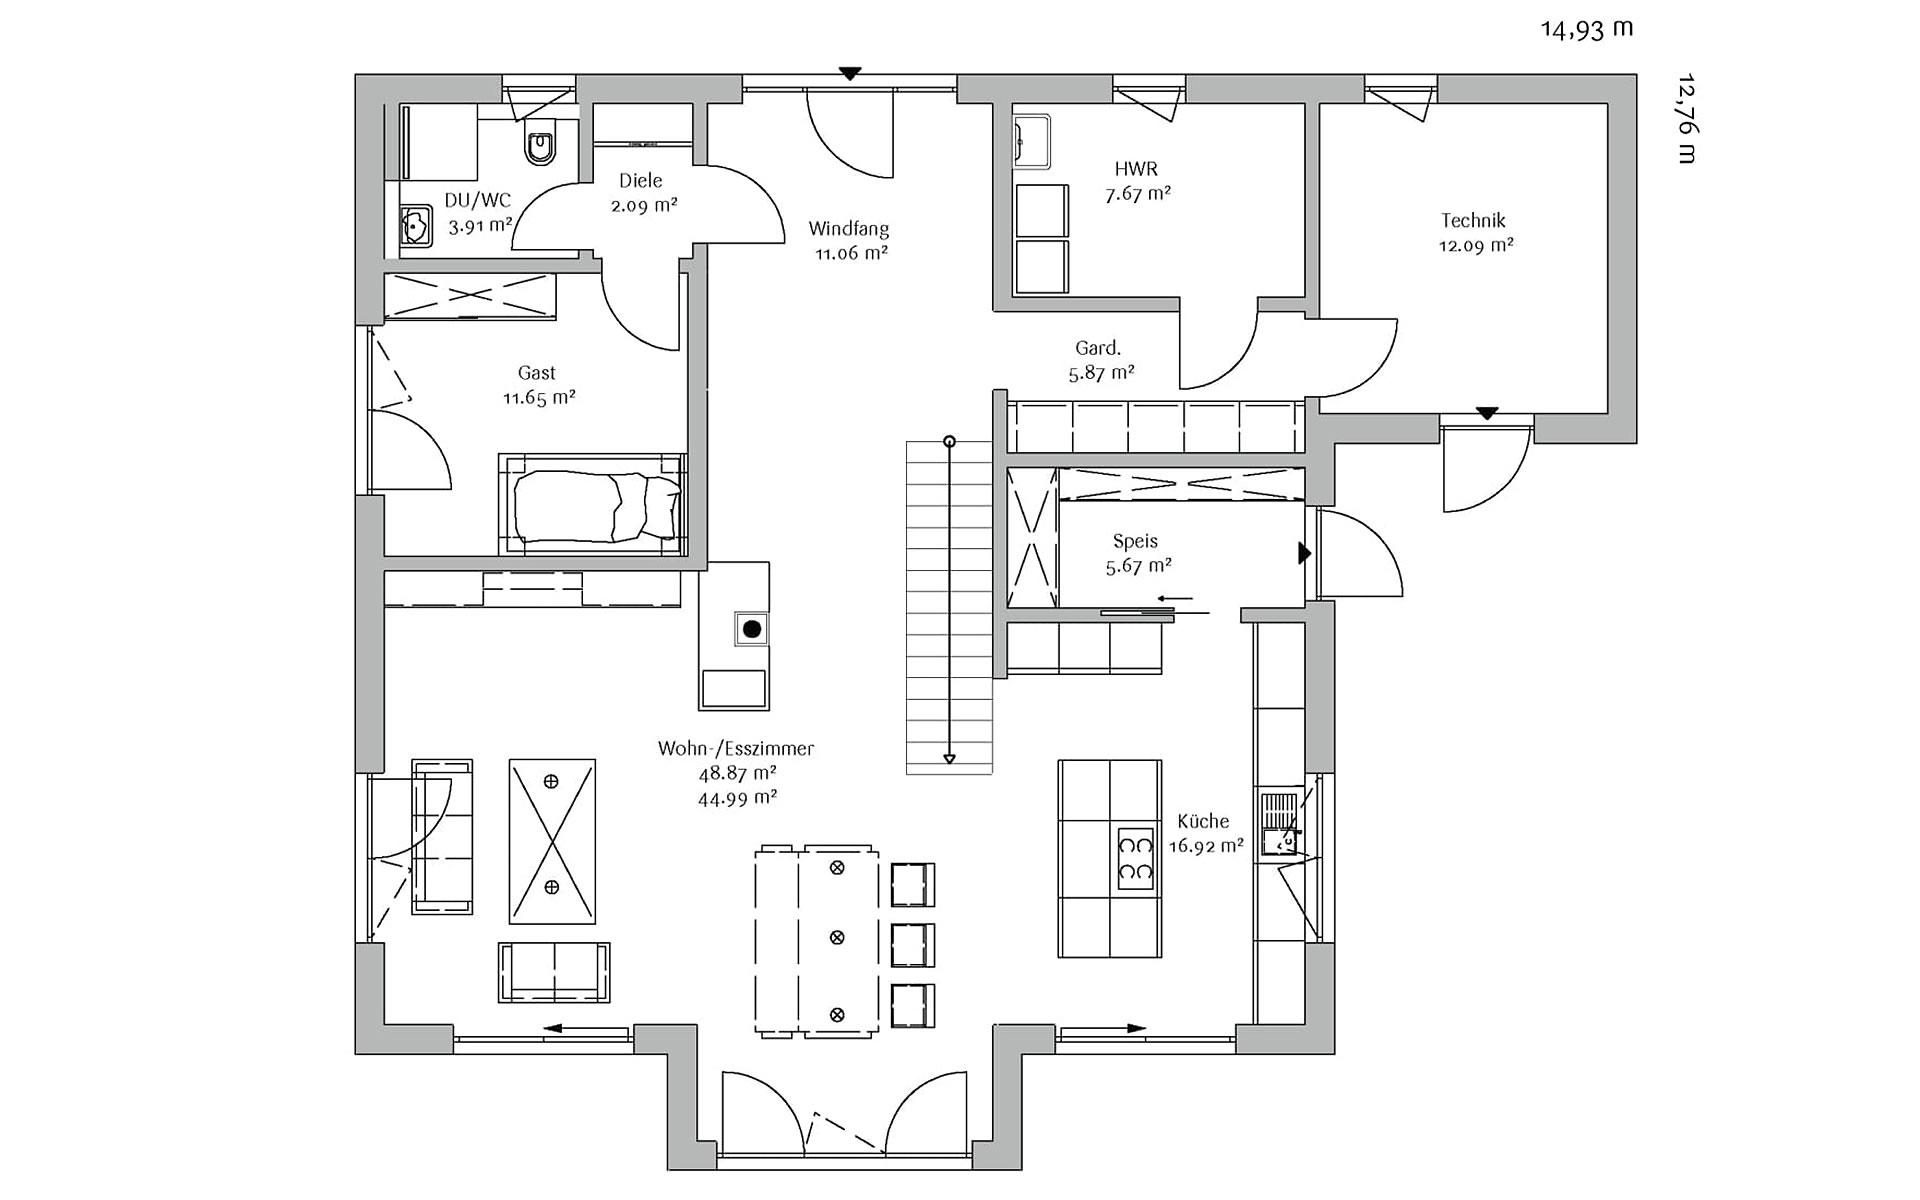 Erdgeschoss Stadtvilla 247 von FischerHaus GmbH & Co. KG